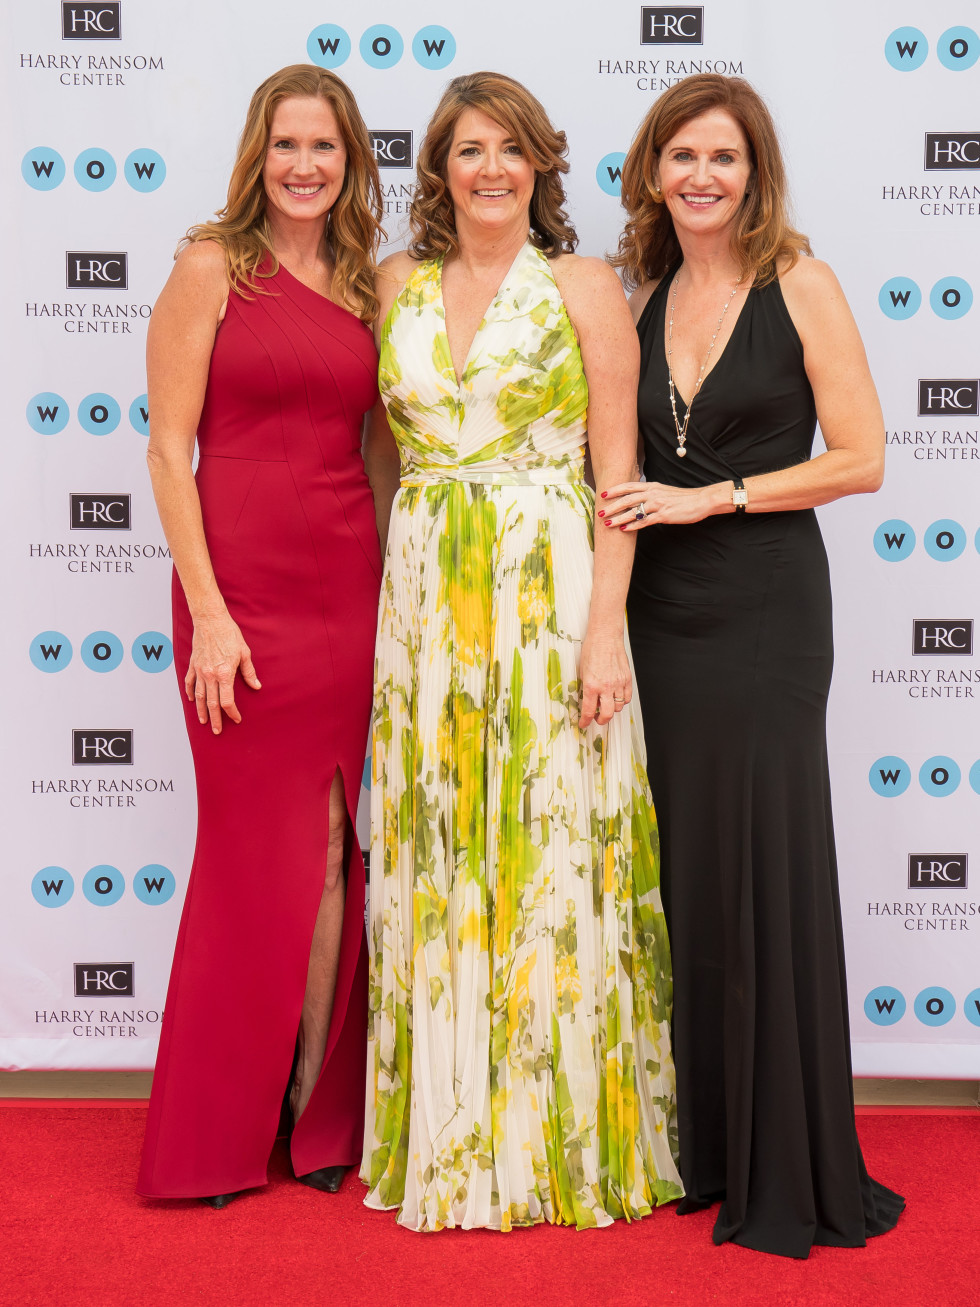 Ransom Center World of Wonders Gala 2017 Jennifer Kuczaj Margie Rine Kelly Cooper McClure